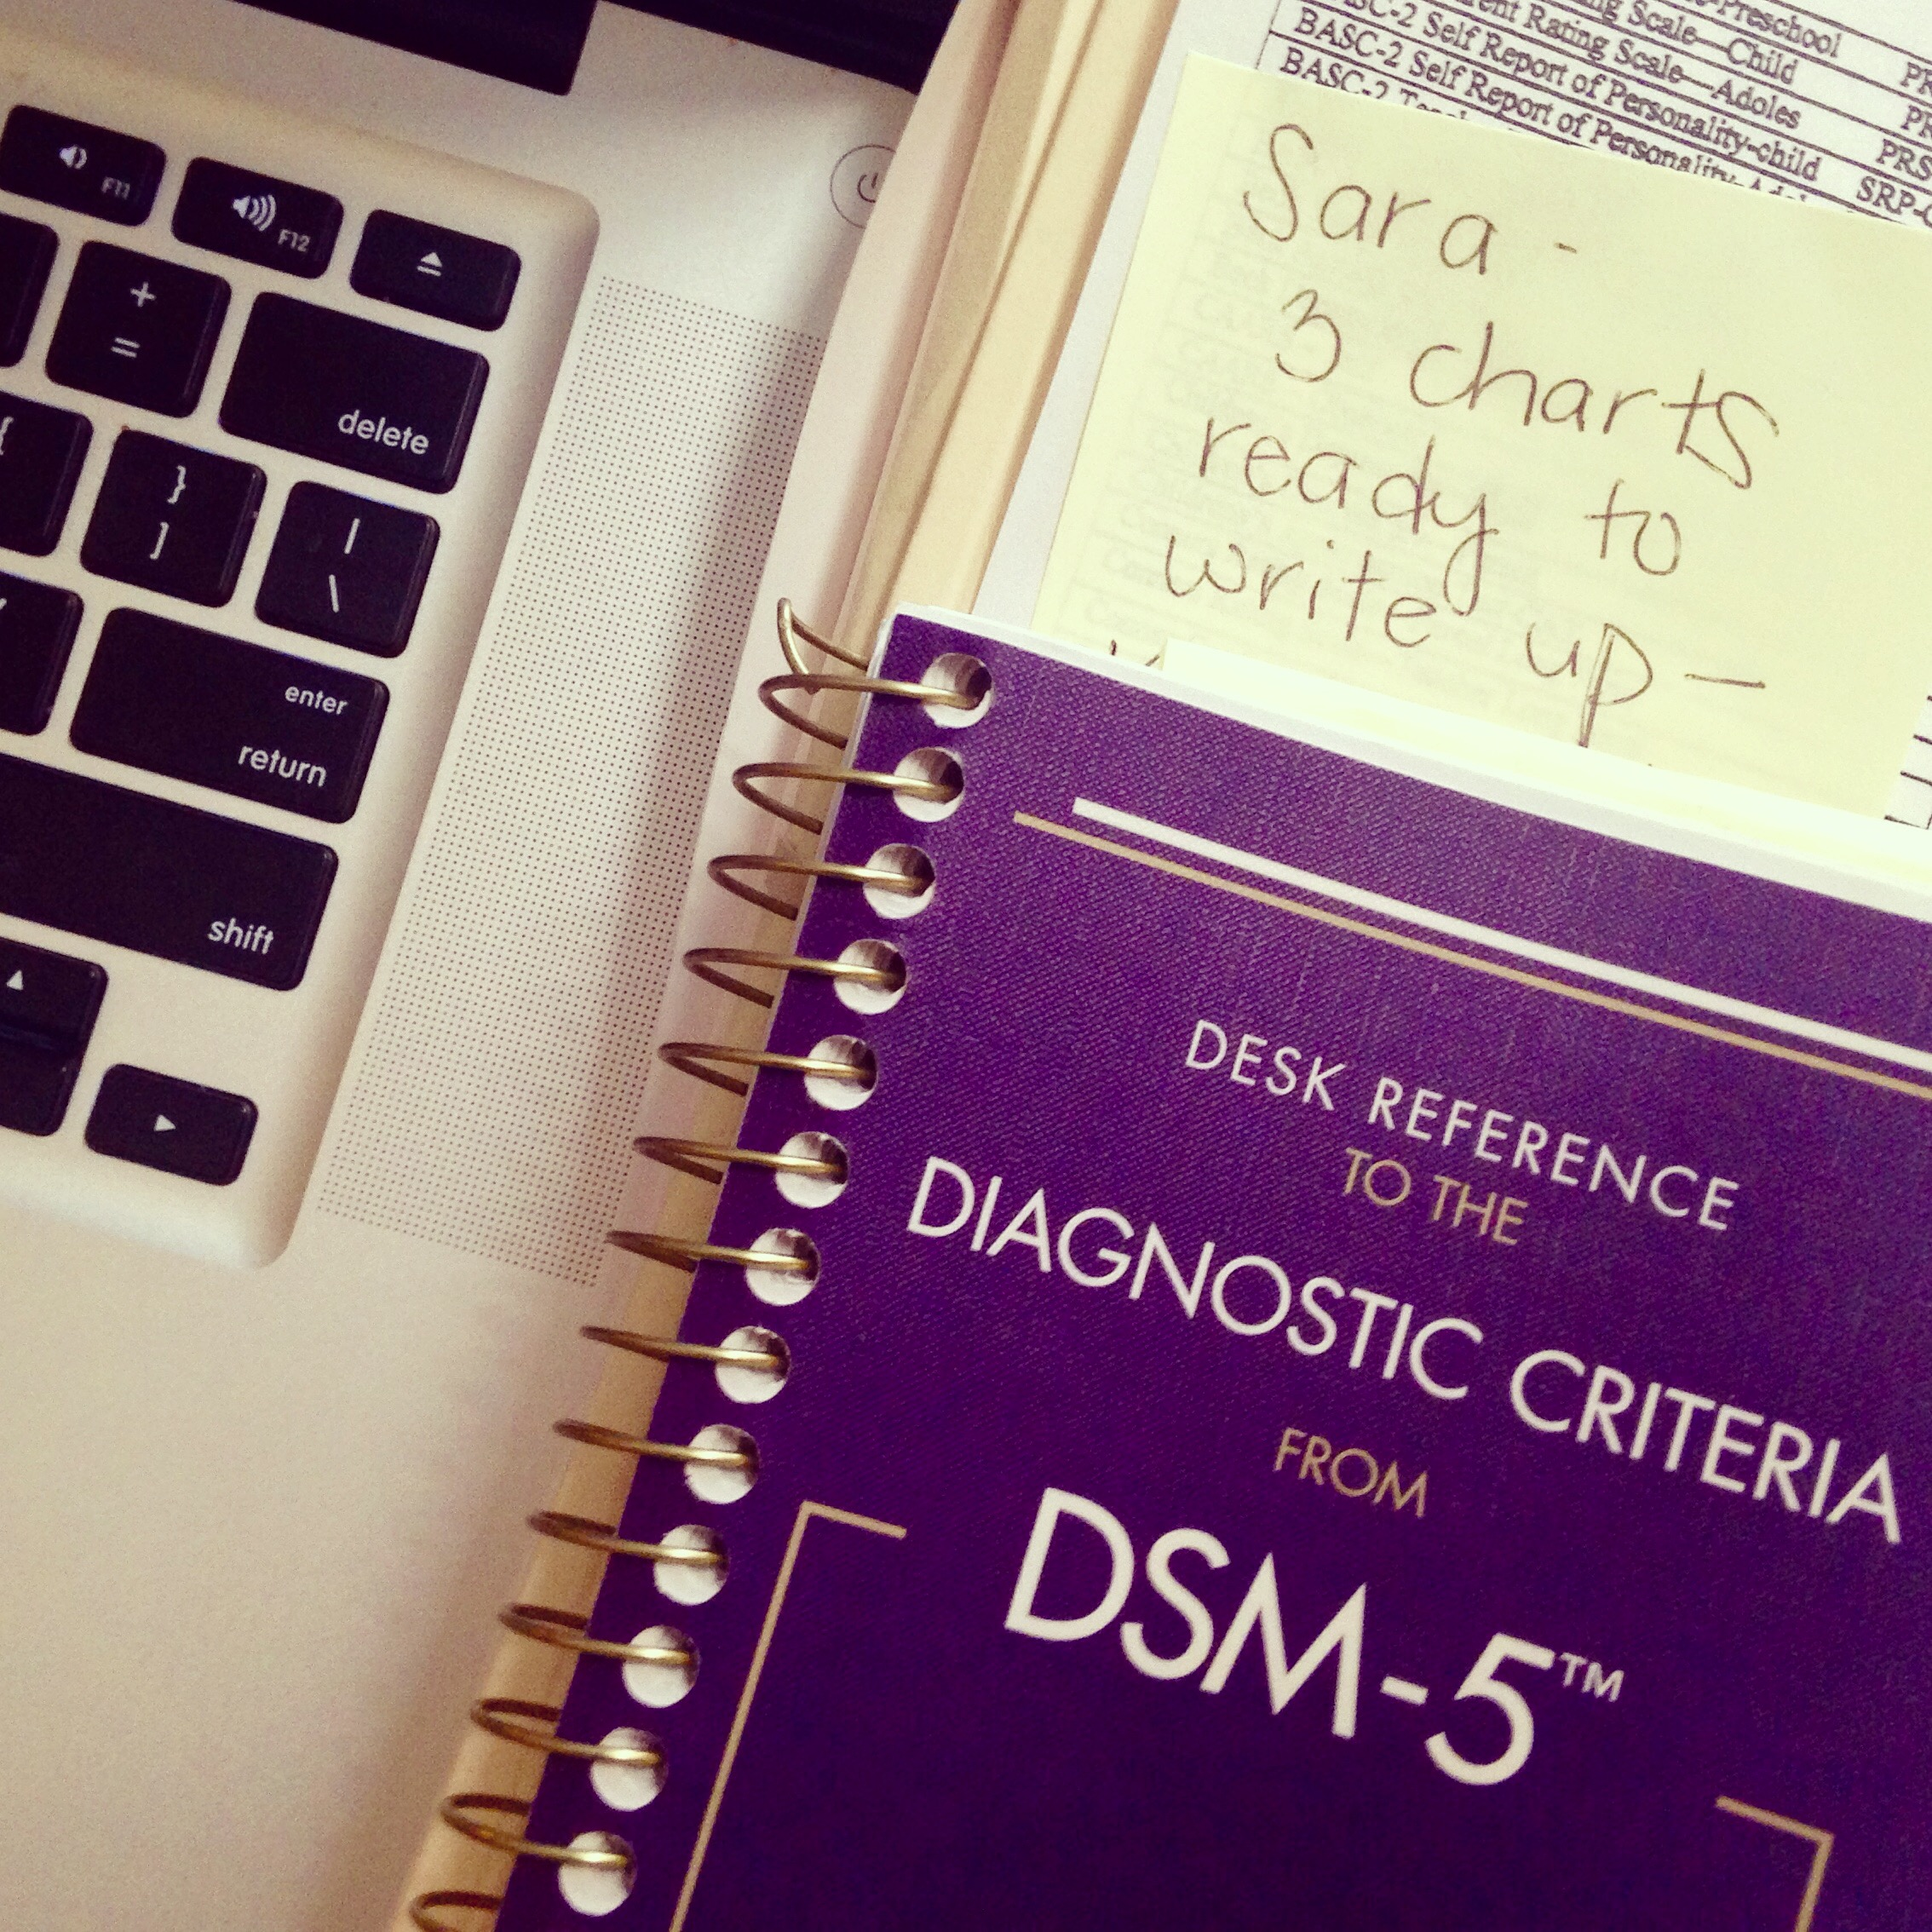 DSM-5, computer keyboard, post-it note, psychology work